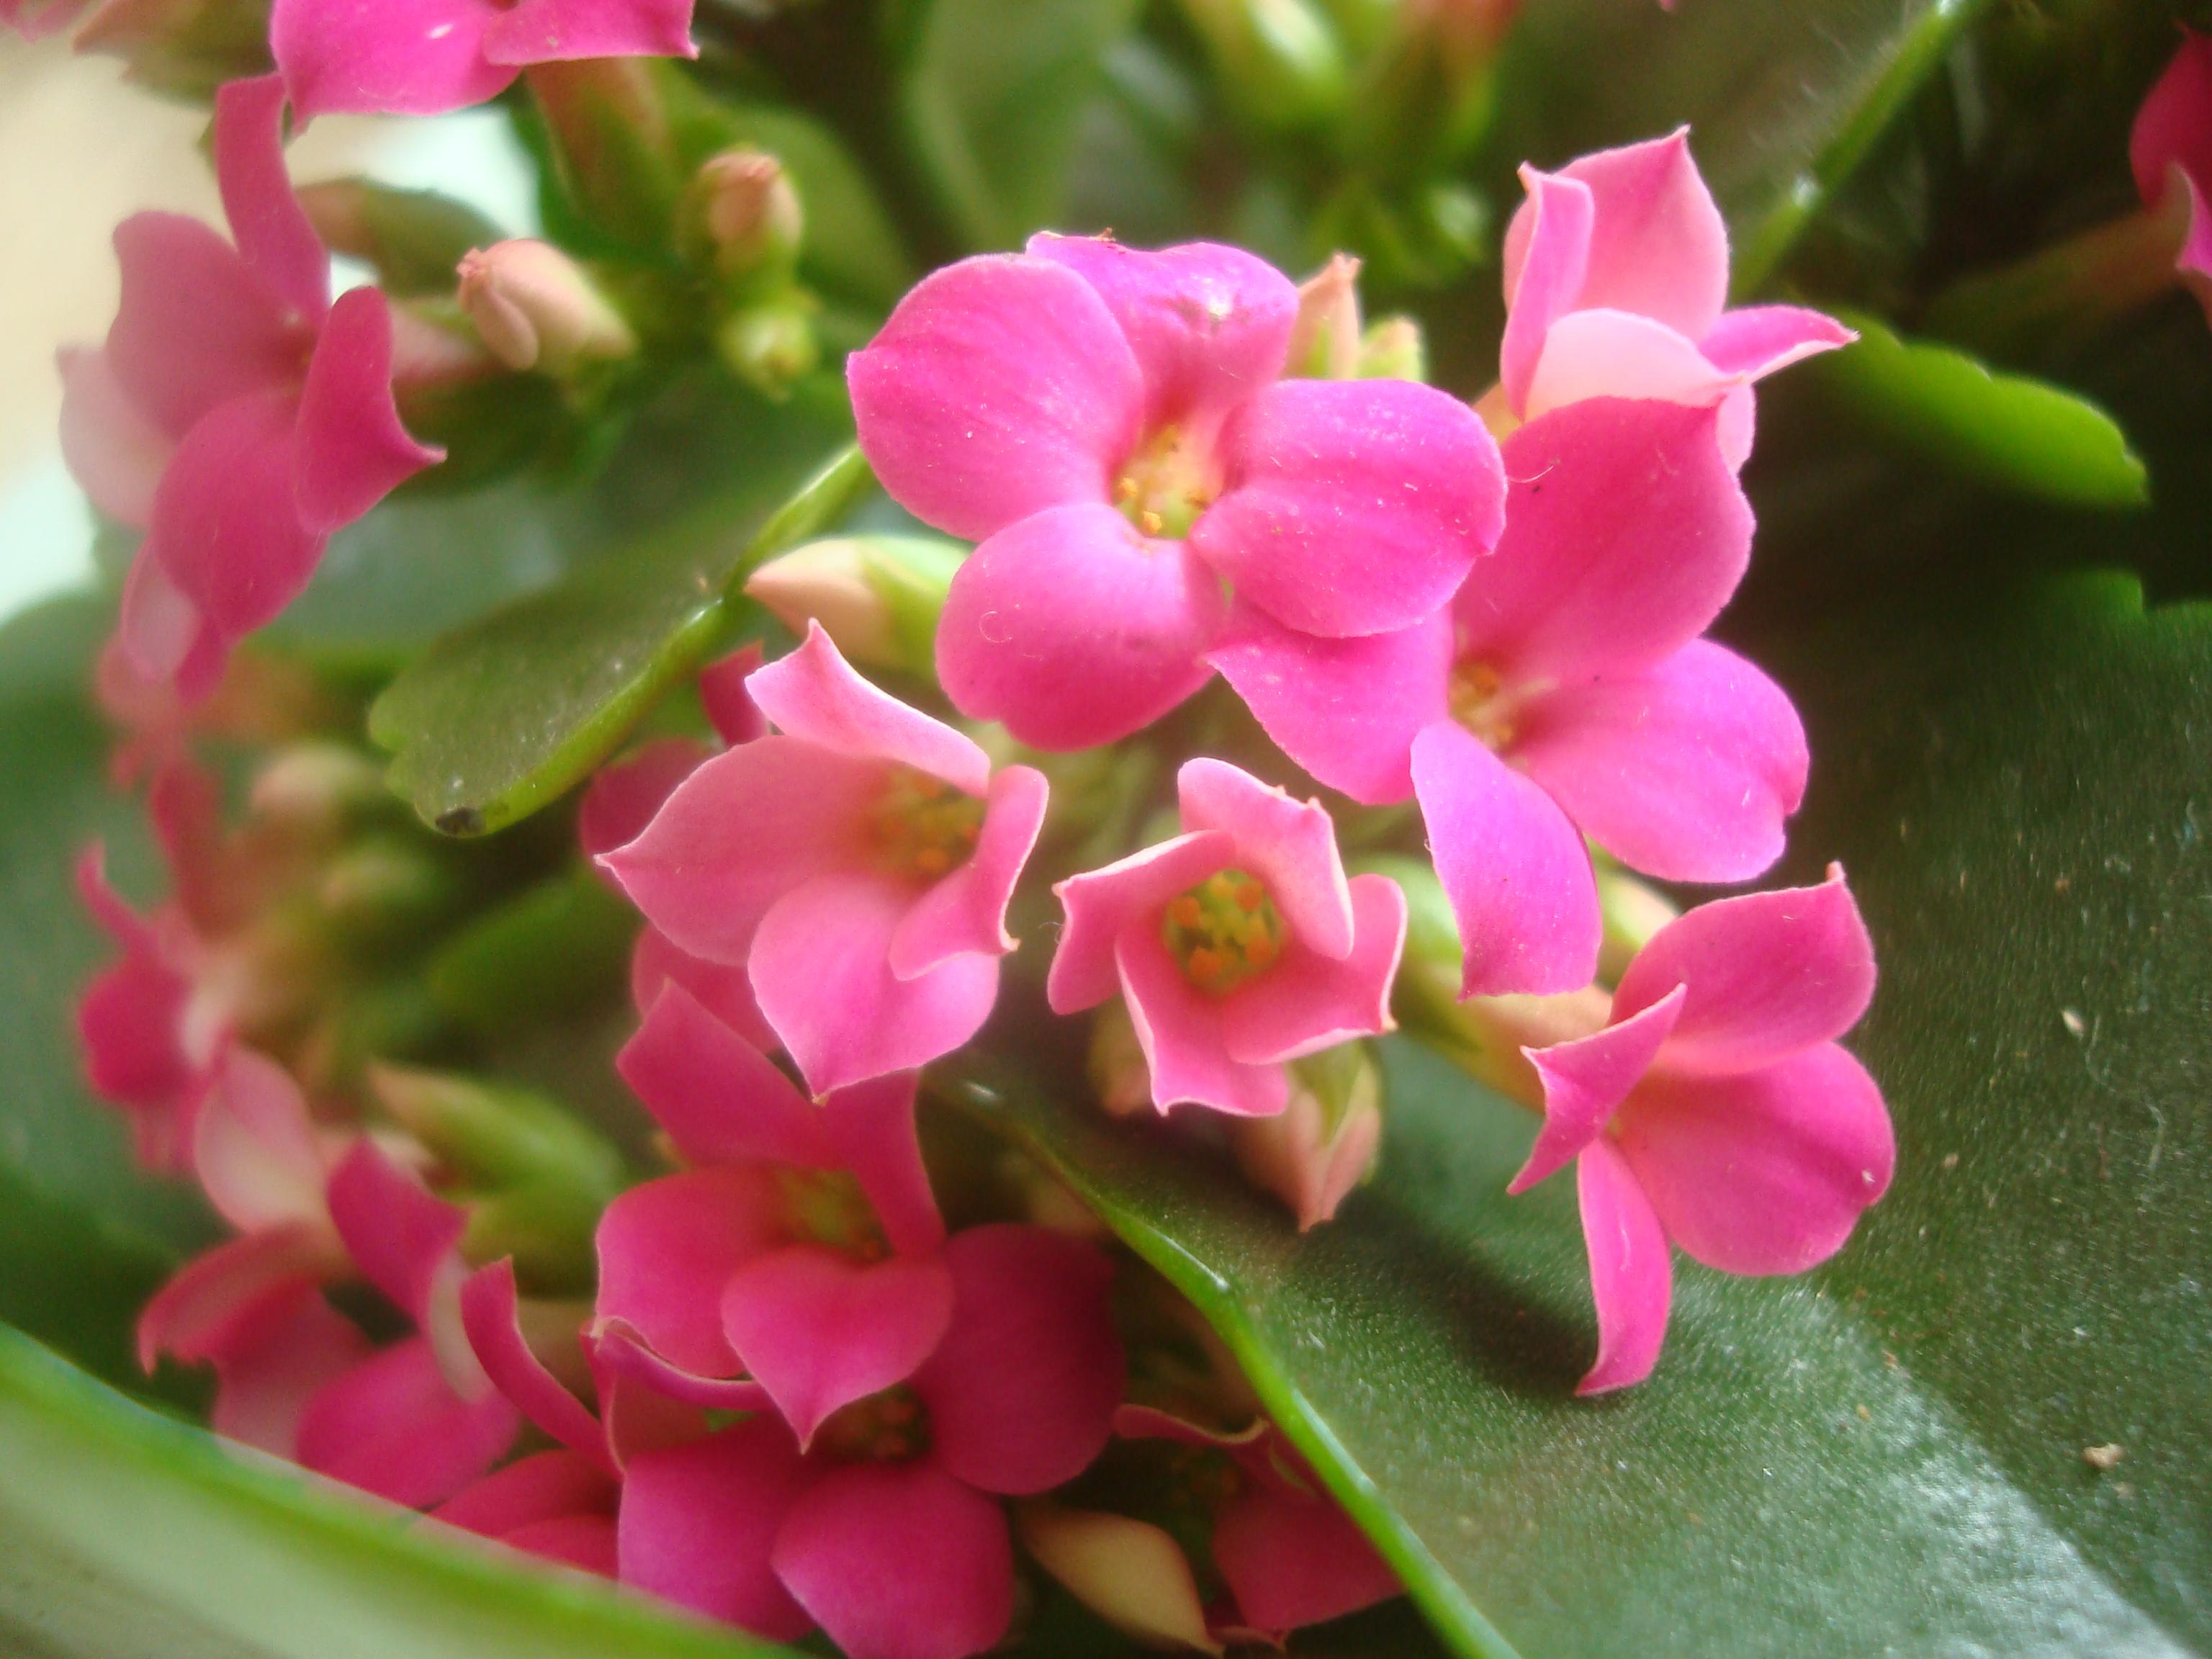 Free Photo Beautiful Pink Flower Garden Nature Plant Free